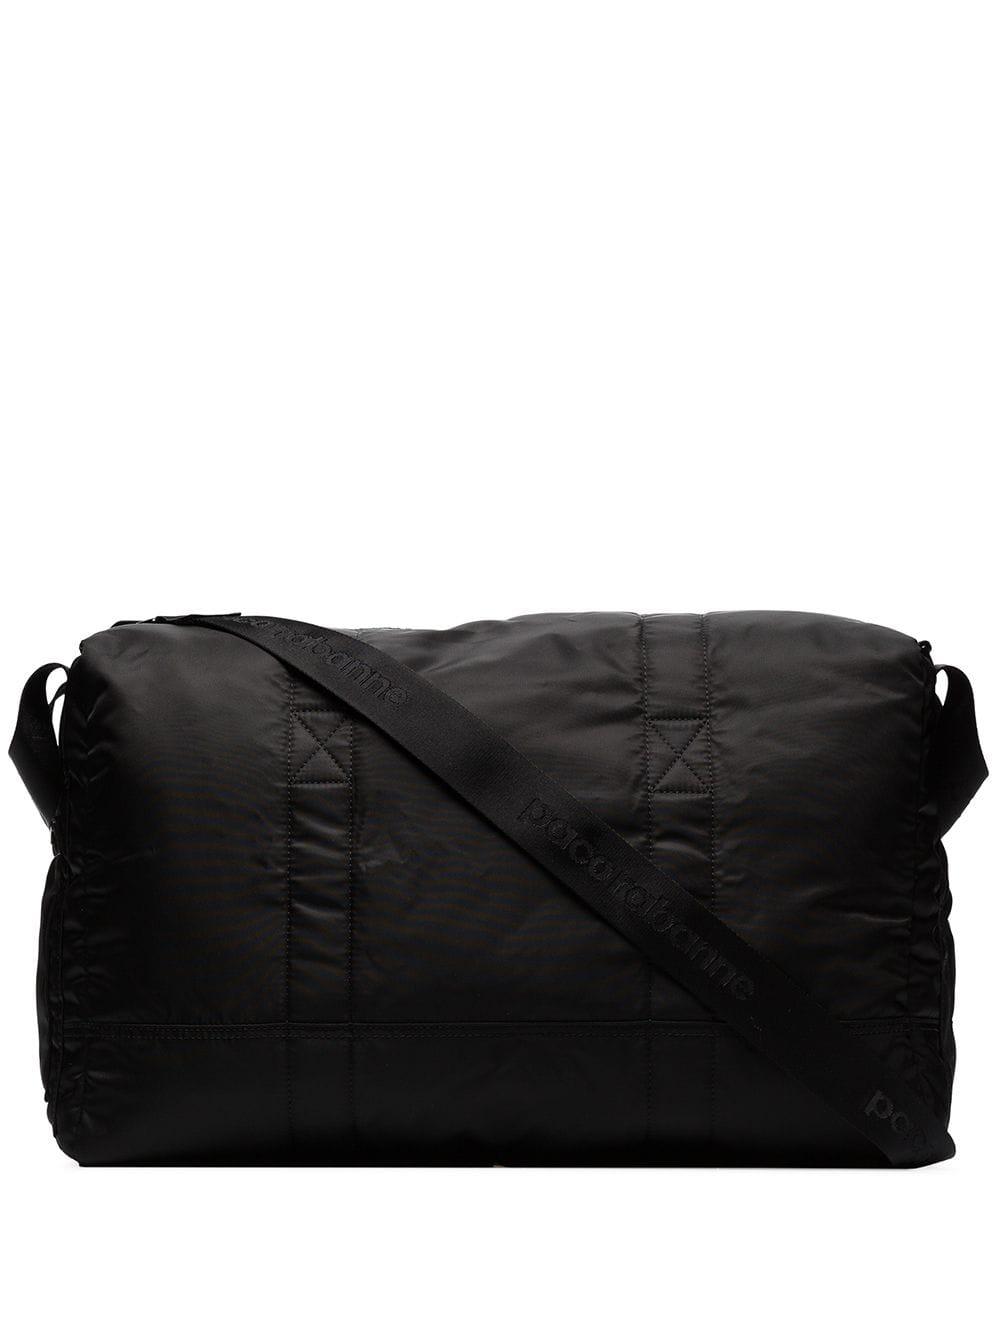 19ASS0075SYN006 BLACK